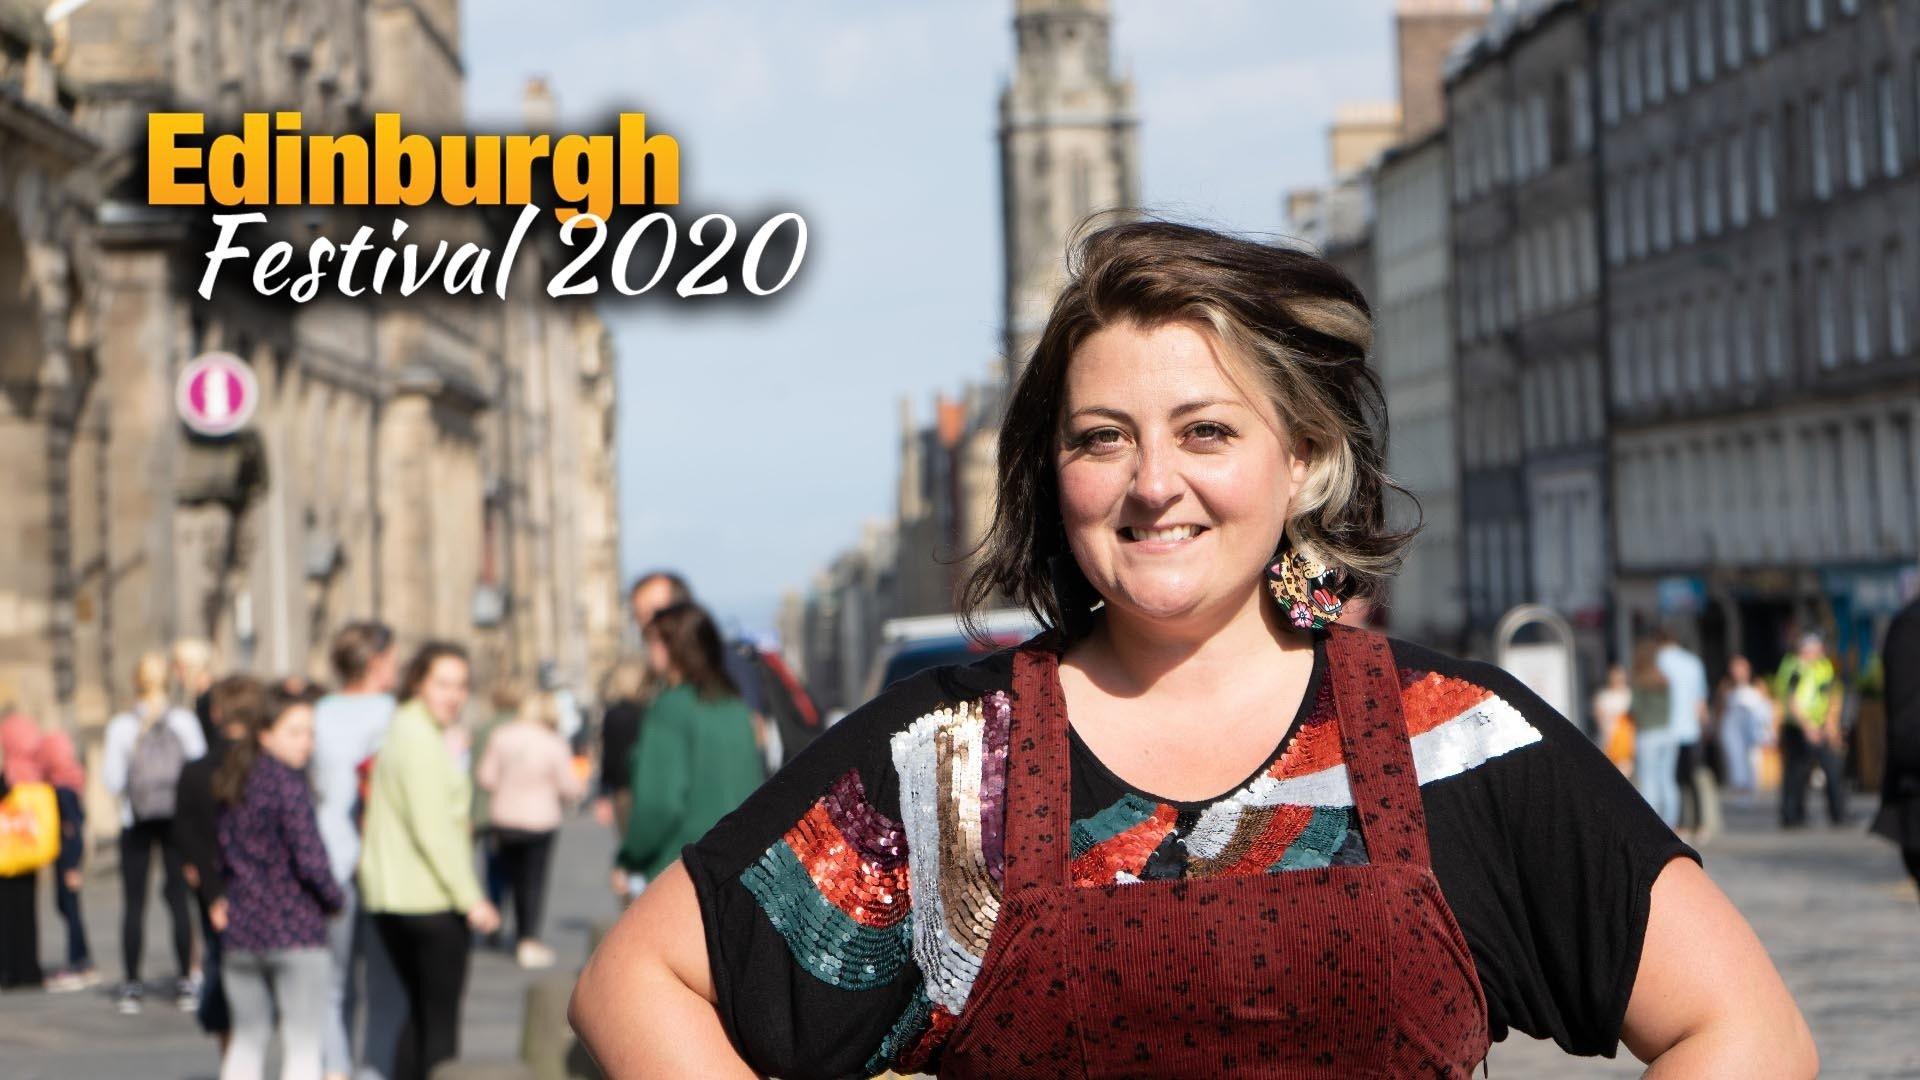 Edinburgh Festival 2020